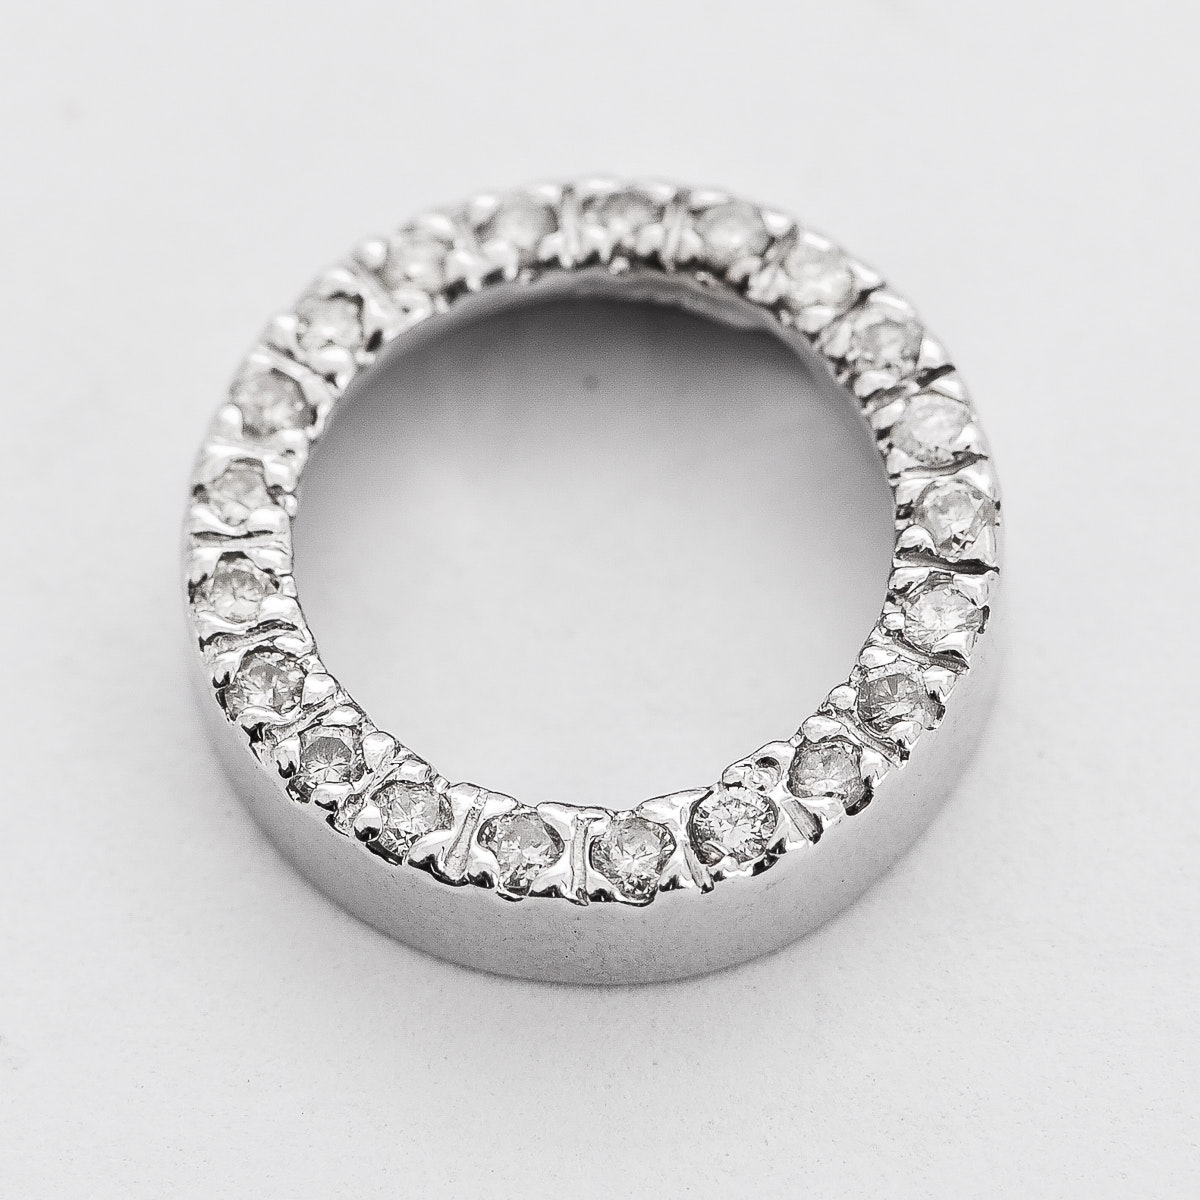 White Gold and Diamond Open Circle Pendant